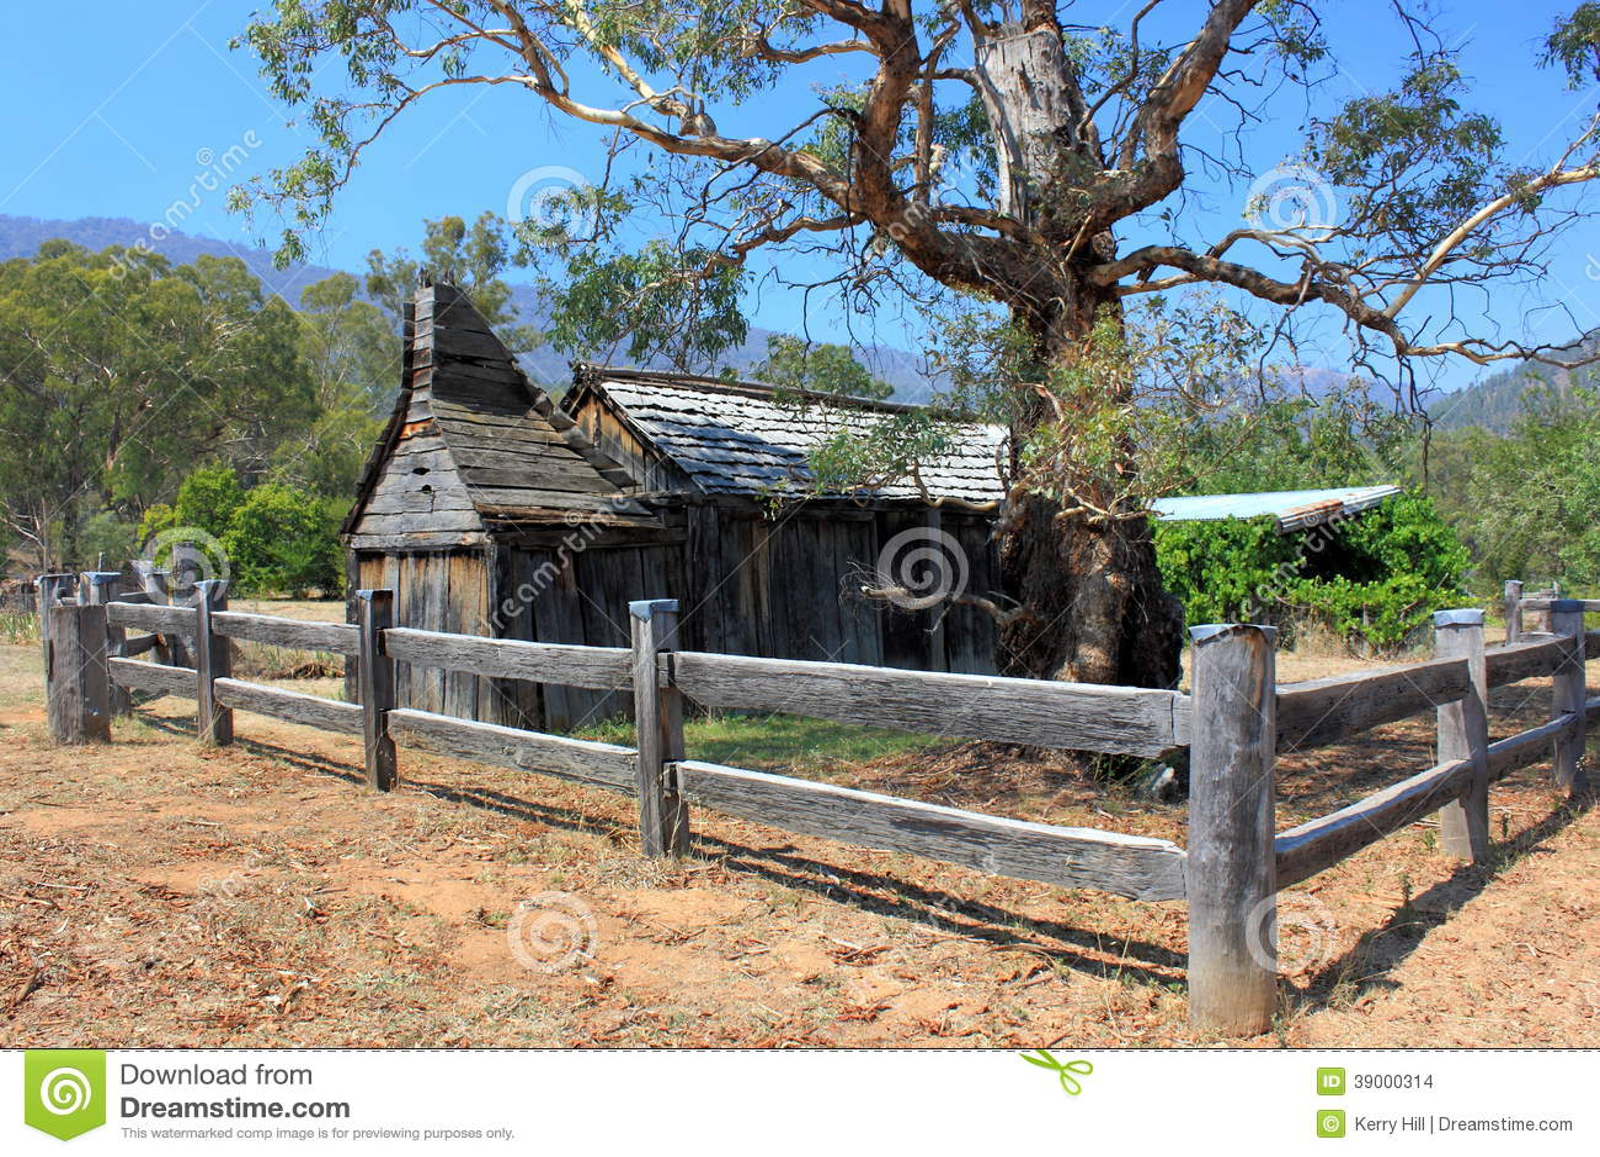 Historical Australian Settlers School House Stock Photo